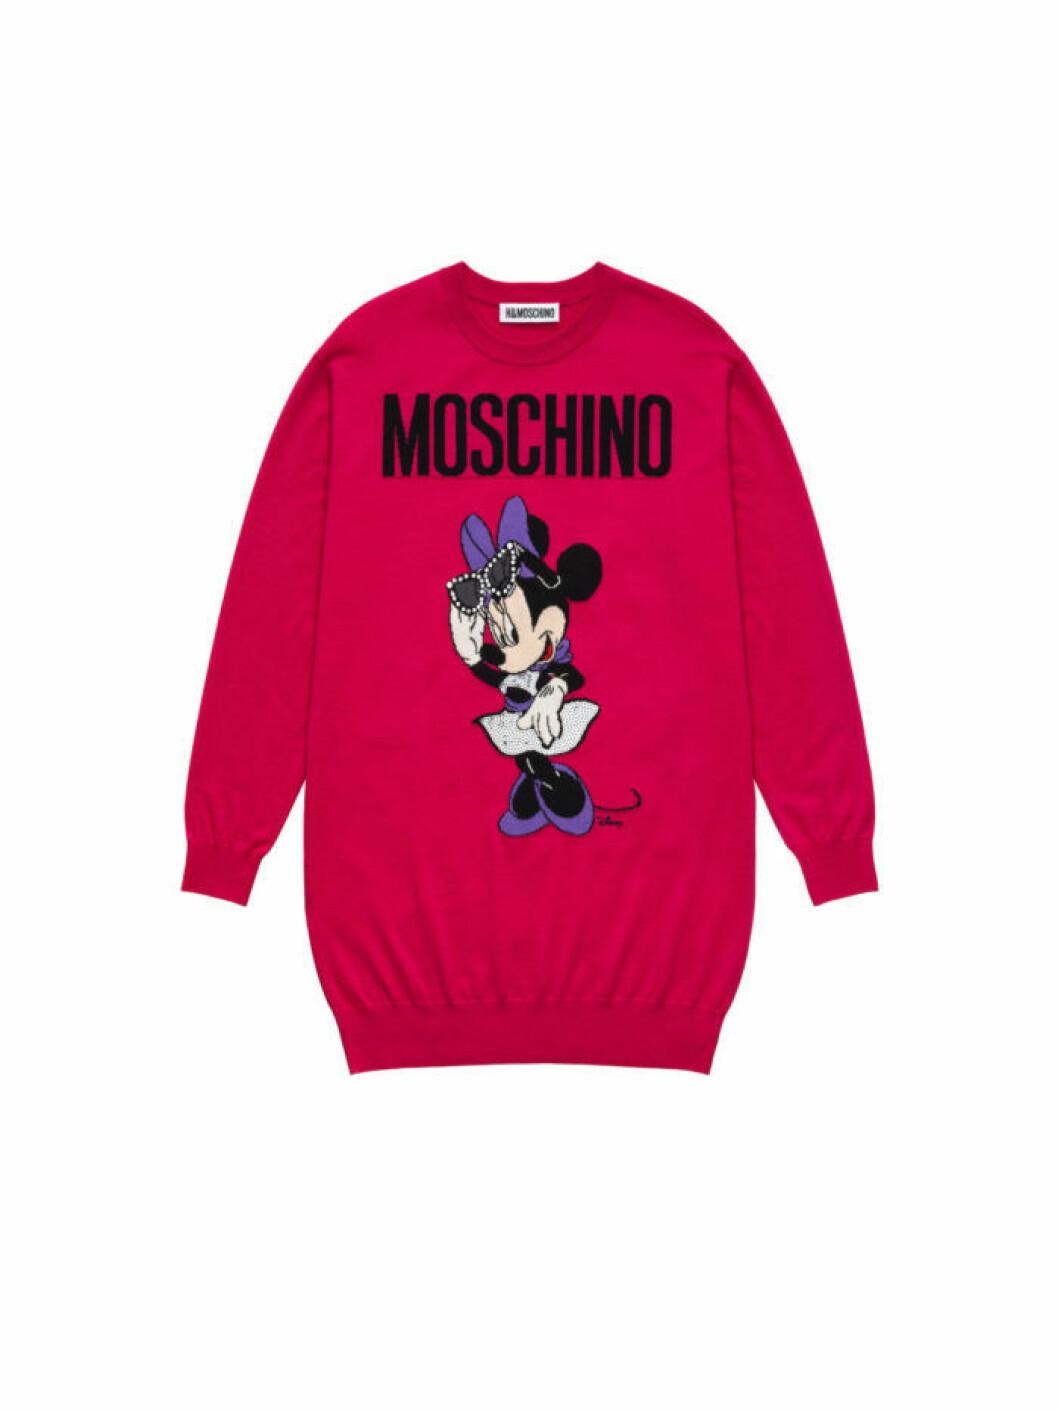 Mimmi Pigg på en röd sweatshirt Moschino [tv] H&M